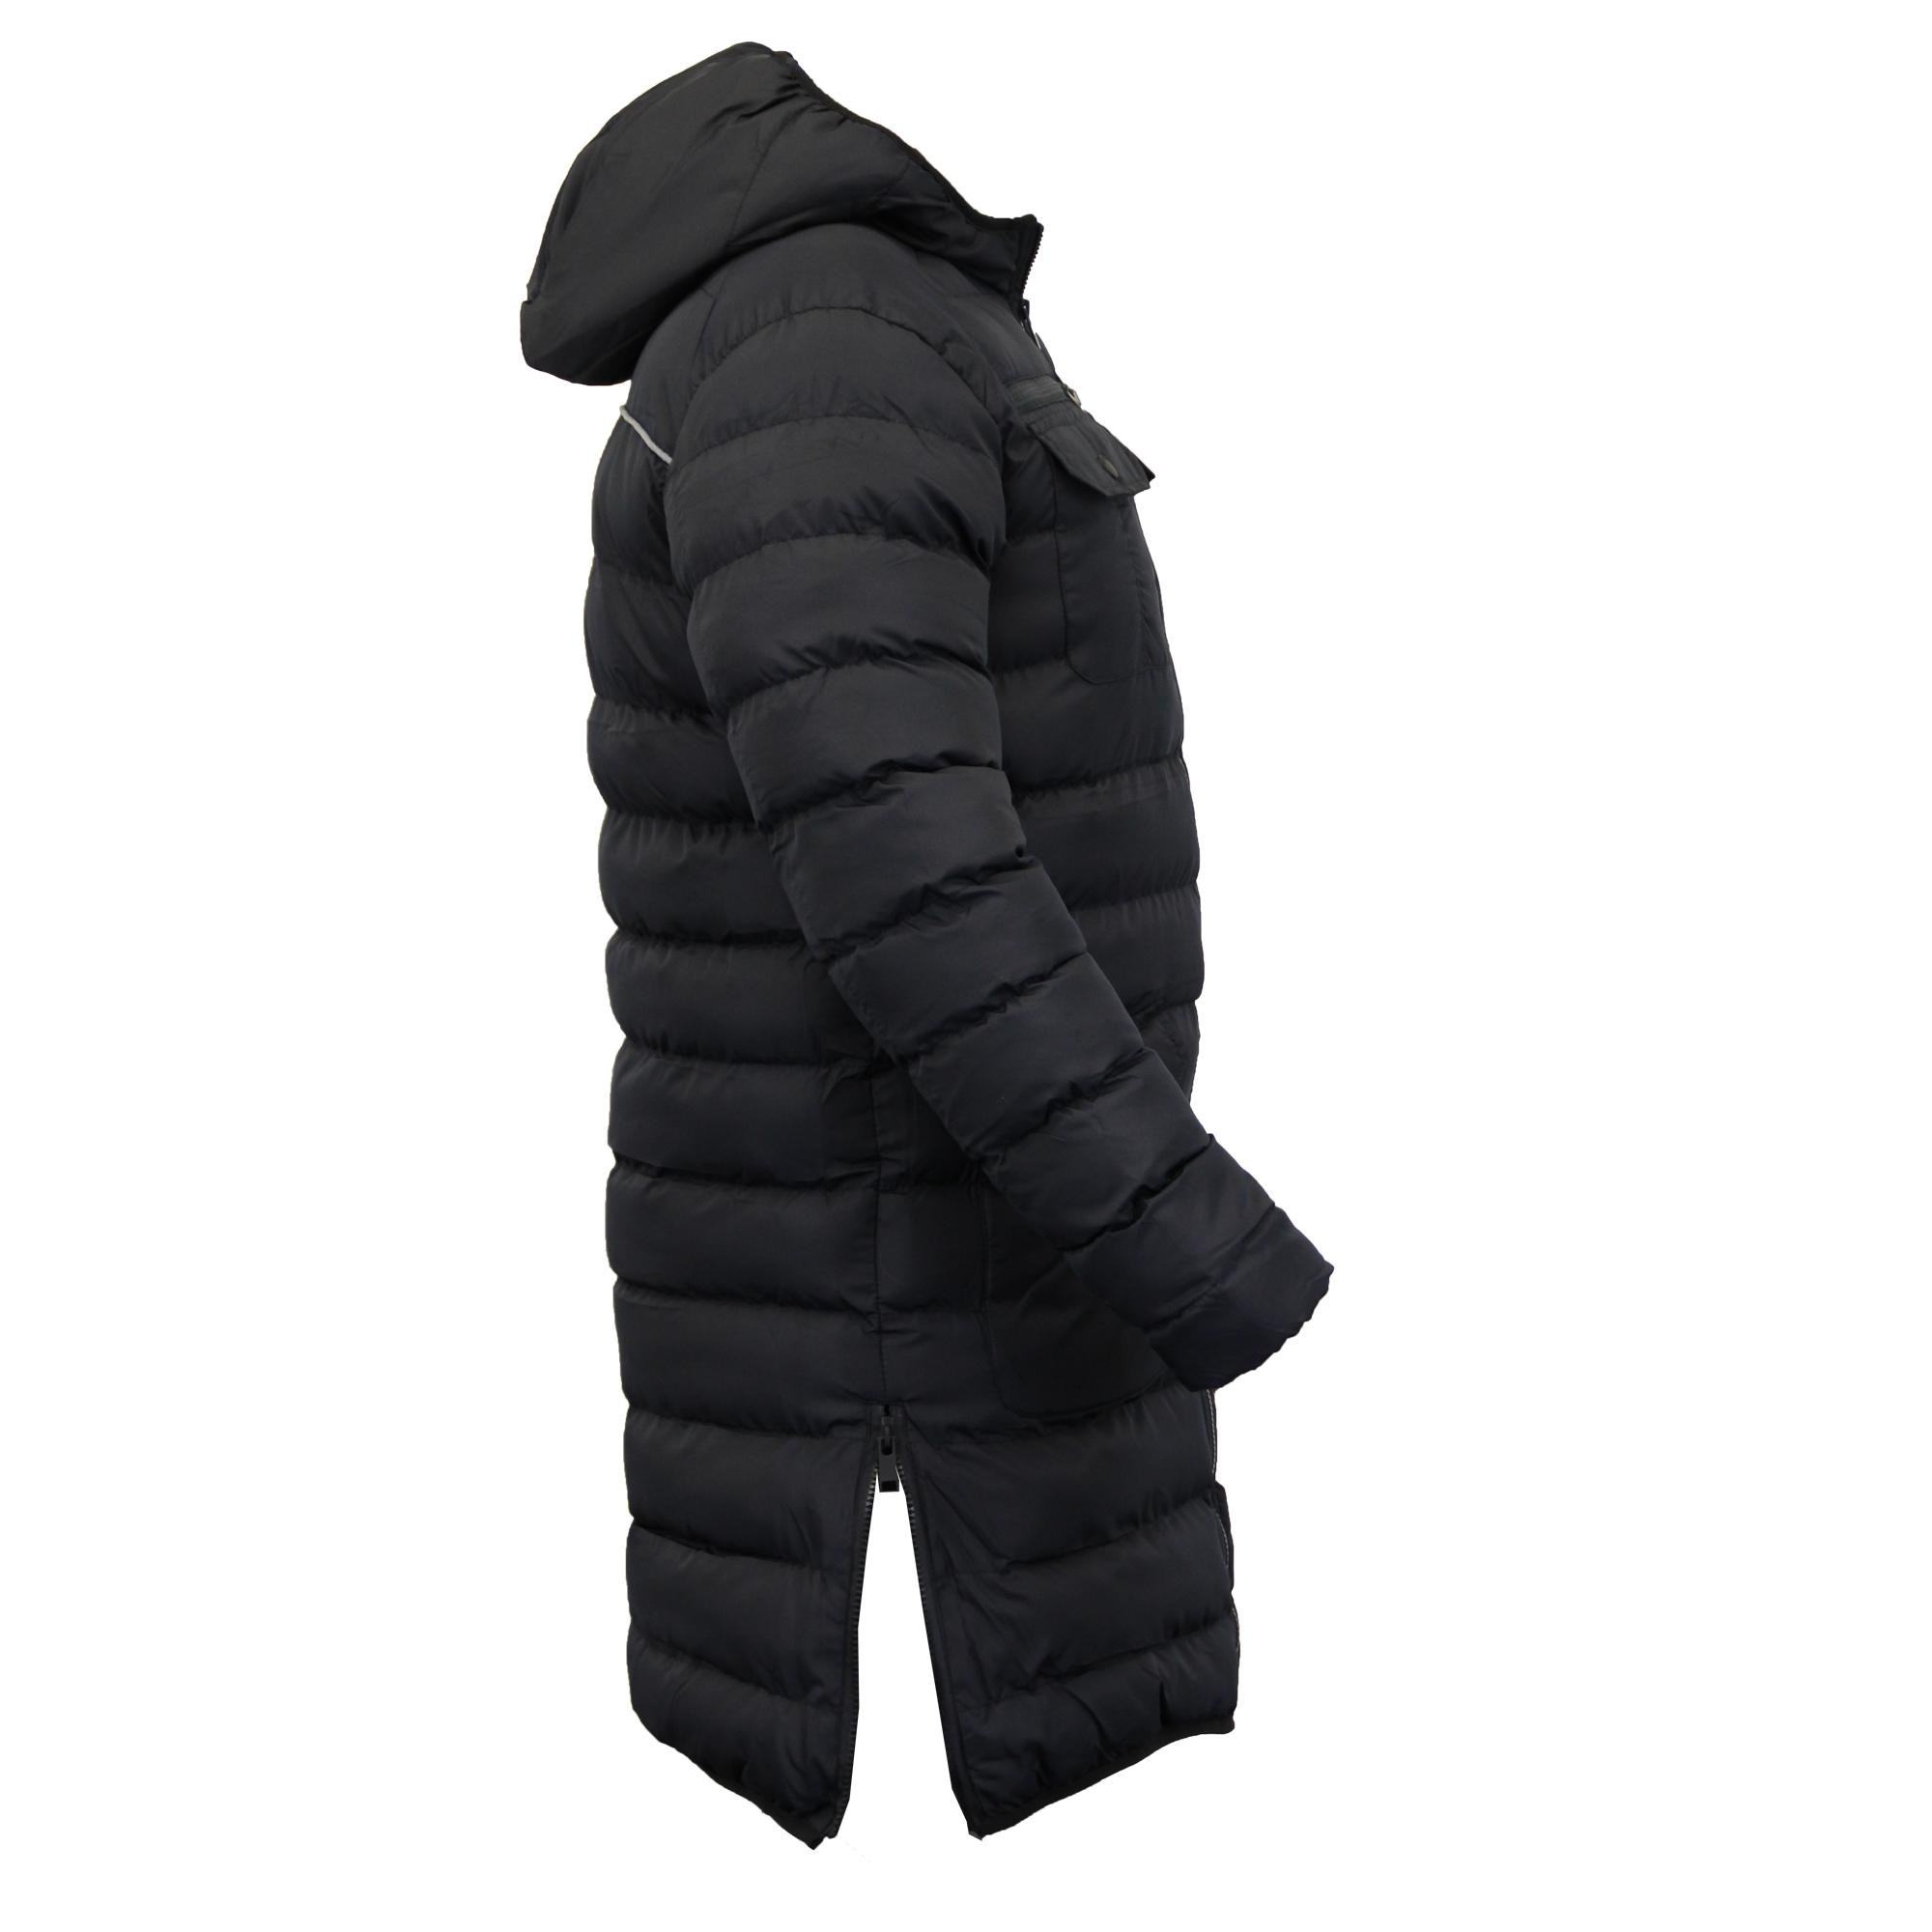 Mens Camo Jacket Brave Soul Harrington Long MA1 Mac Trench Coat ... : mens long quilted jacket - Adamdwight.com